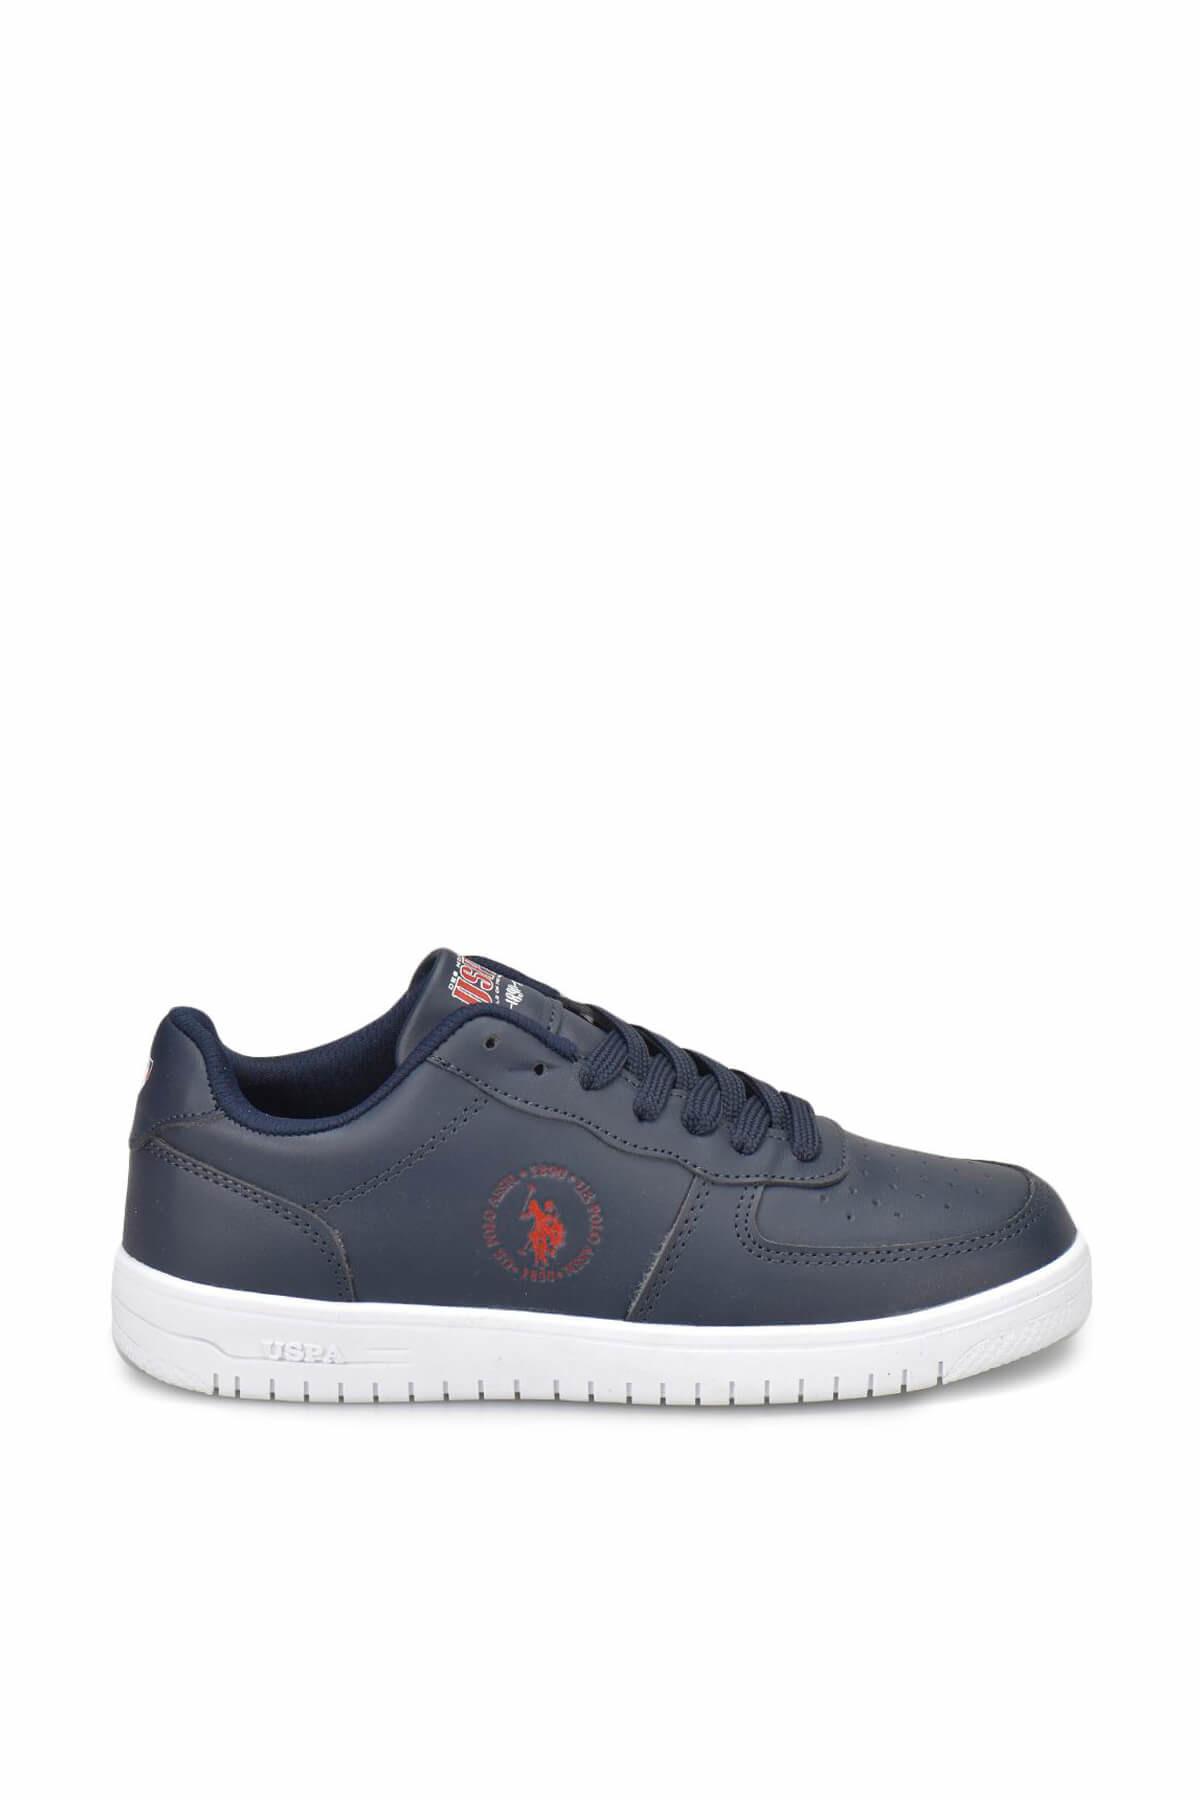 US Polo Assn DIMLER Lacivert Kadın Sneaker 100311281